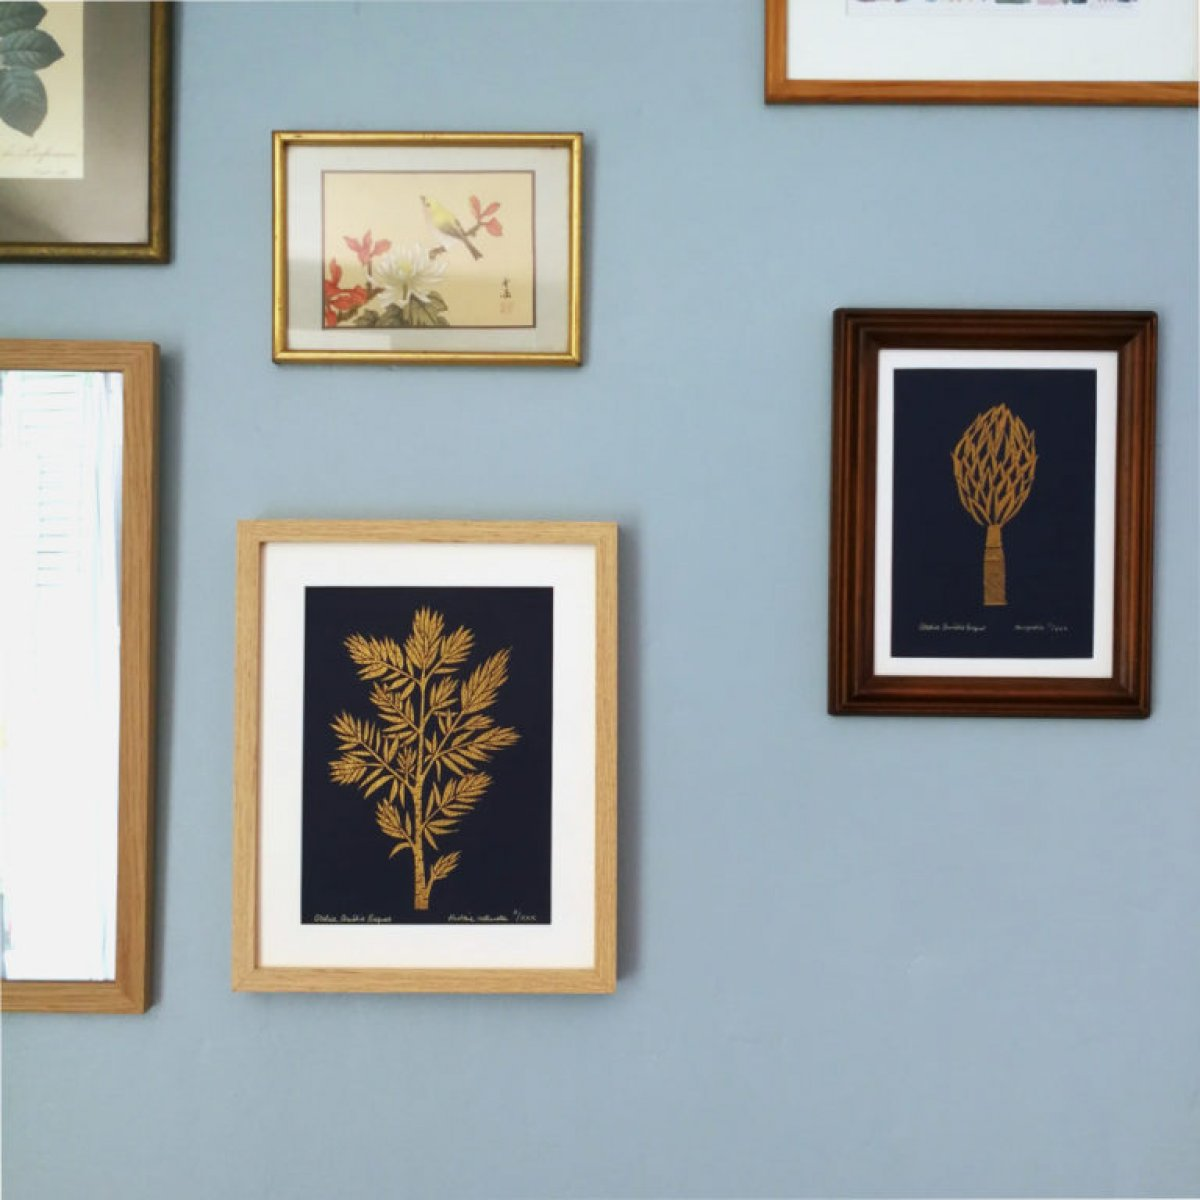 Magnolia et Histoire naturelle, Linogravure originale sur papier 160 grammes.